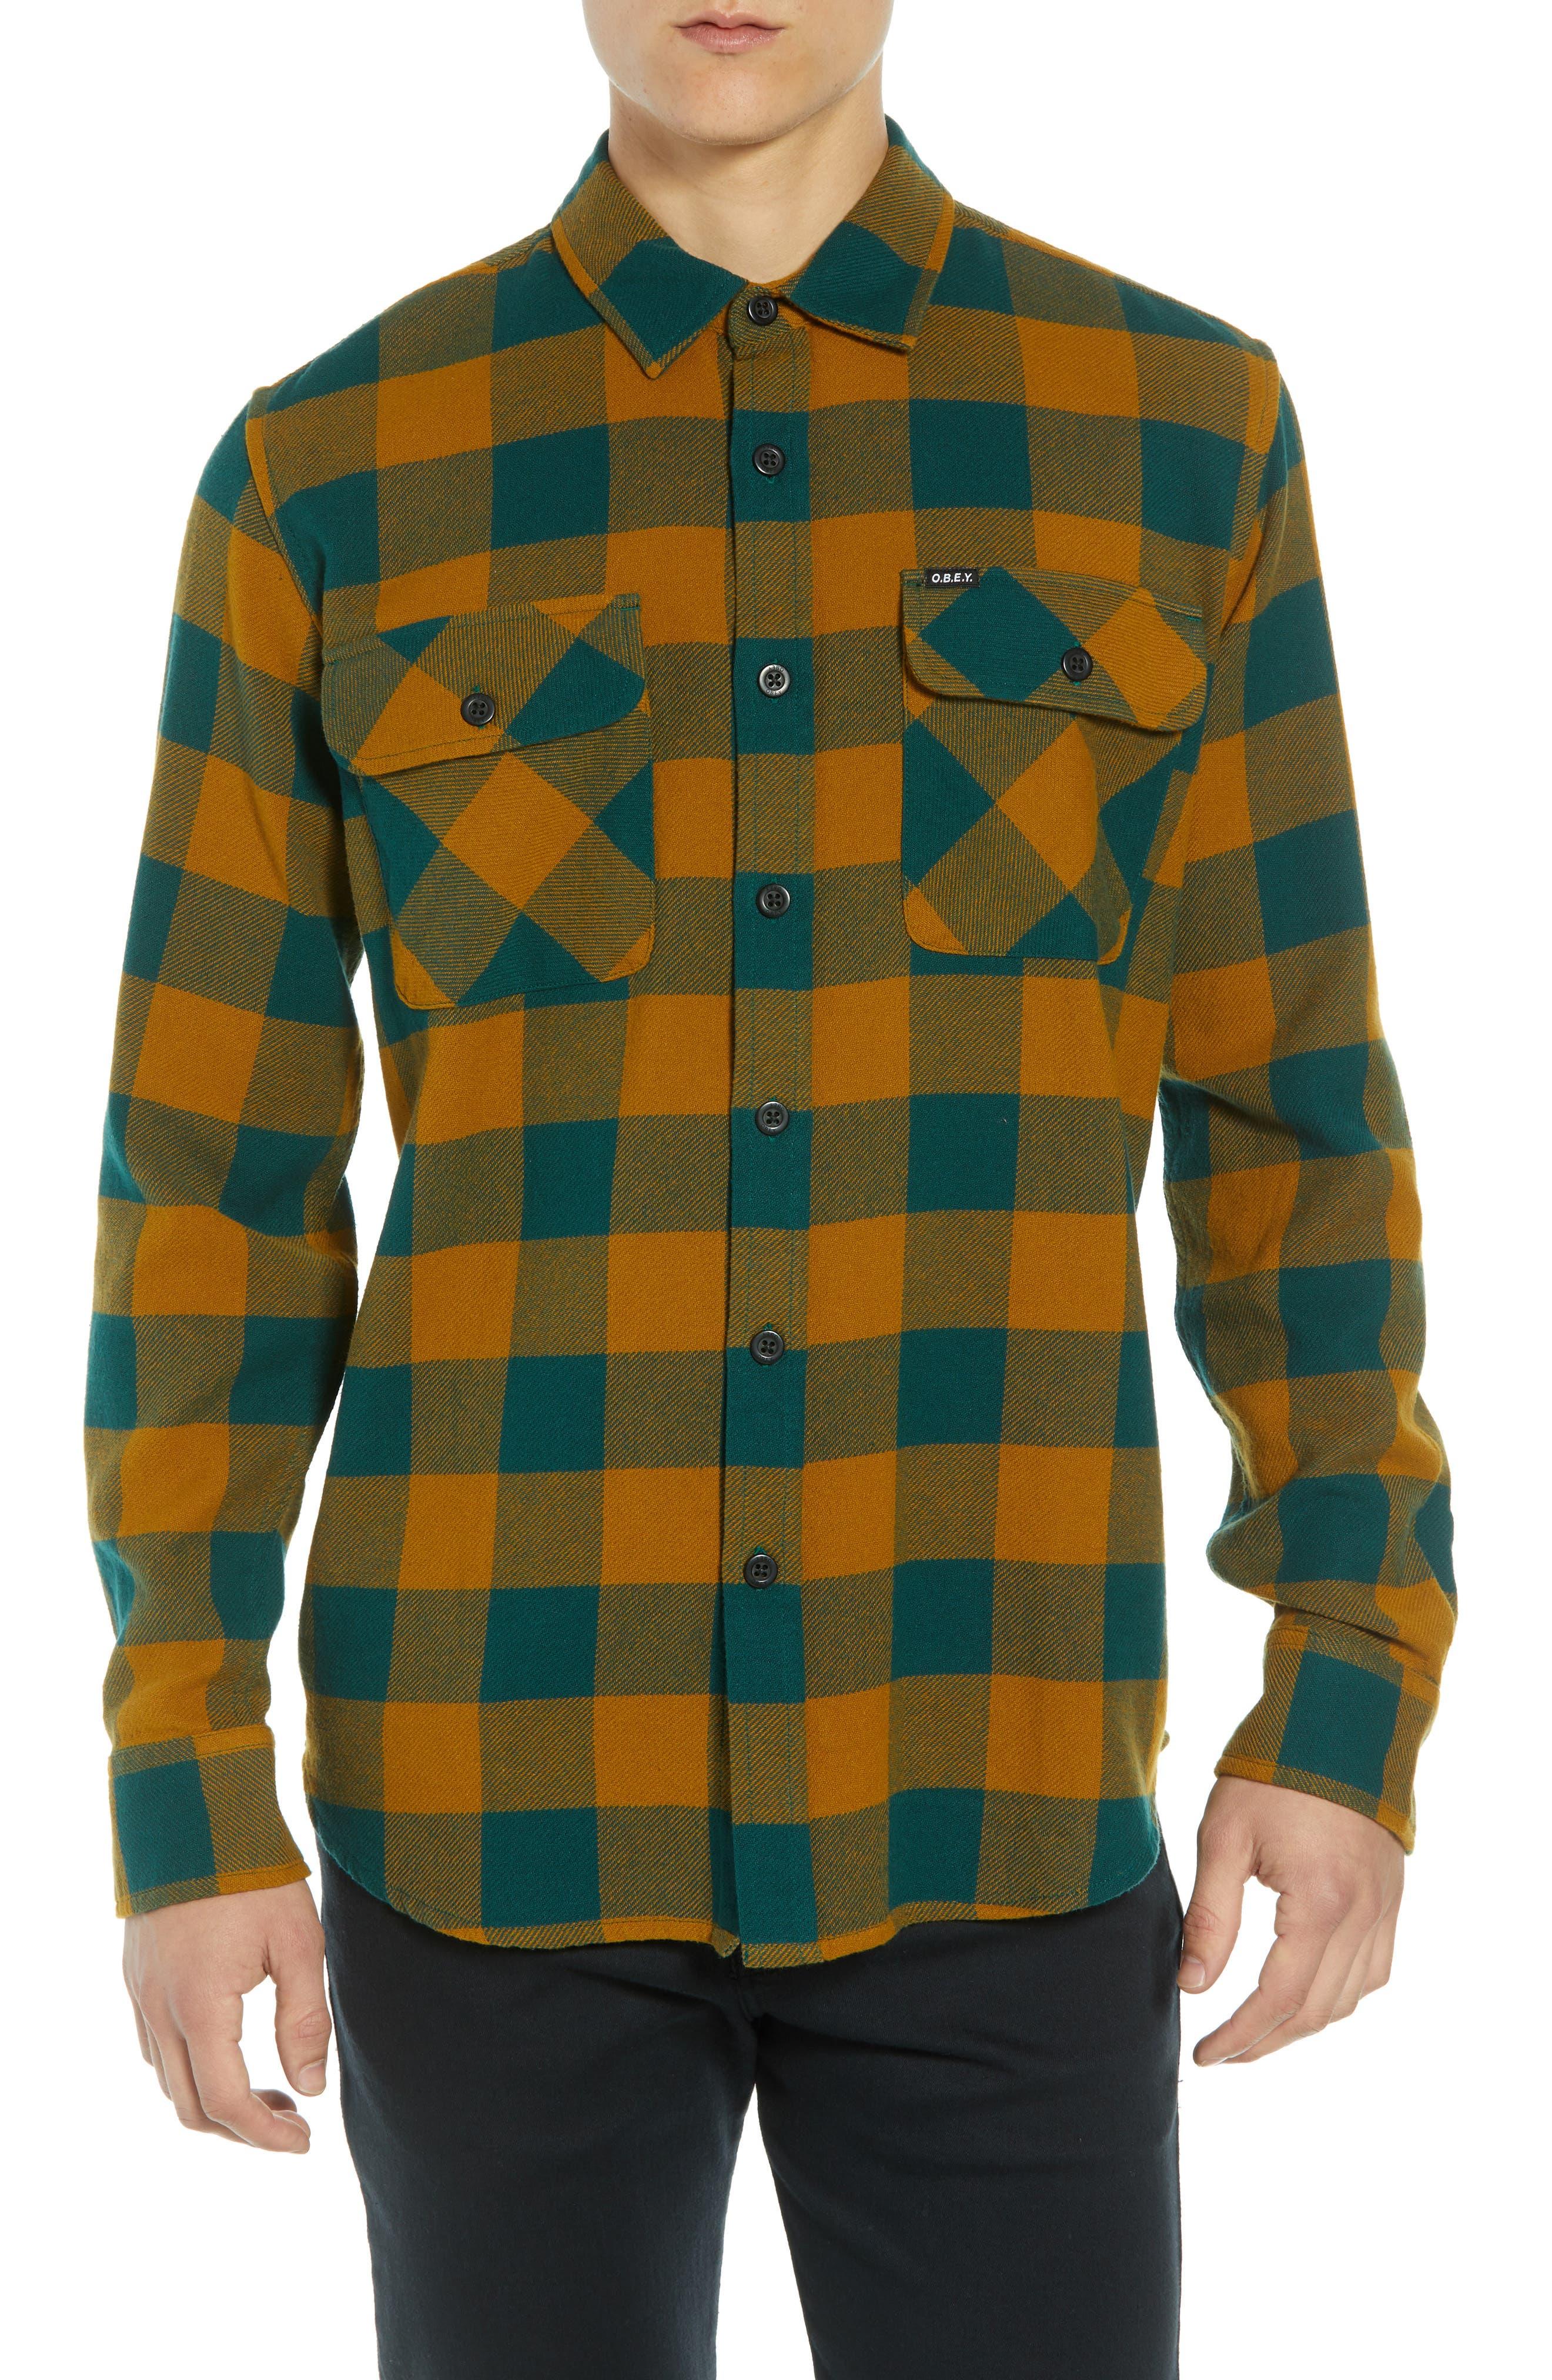 Vedder Buffalo Plaid Flannel Shirt,                             Main thumbnail 1, color,                             DARK TEAL MULTI